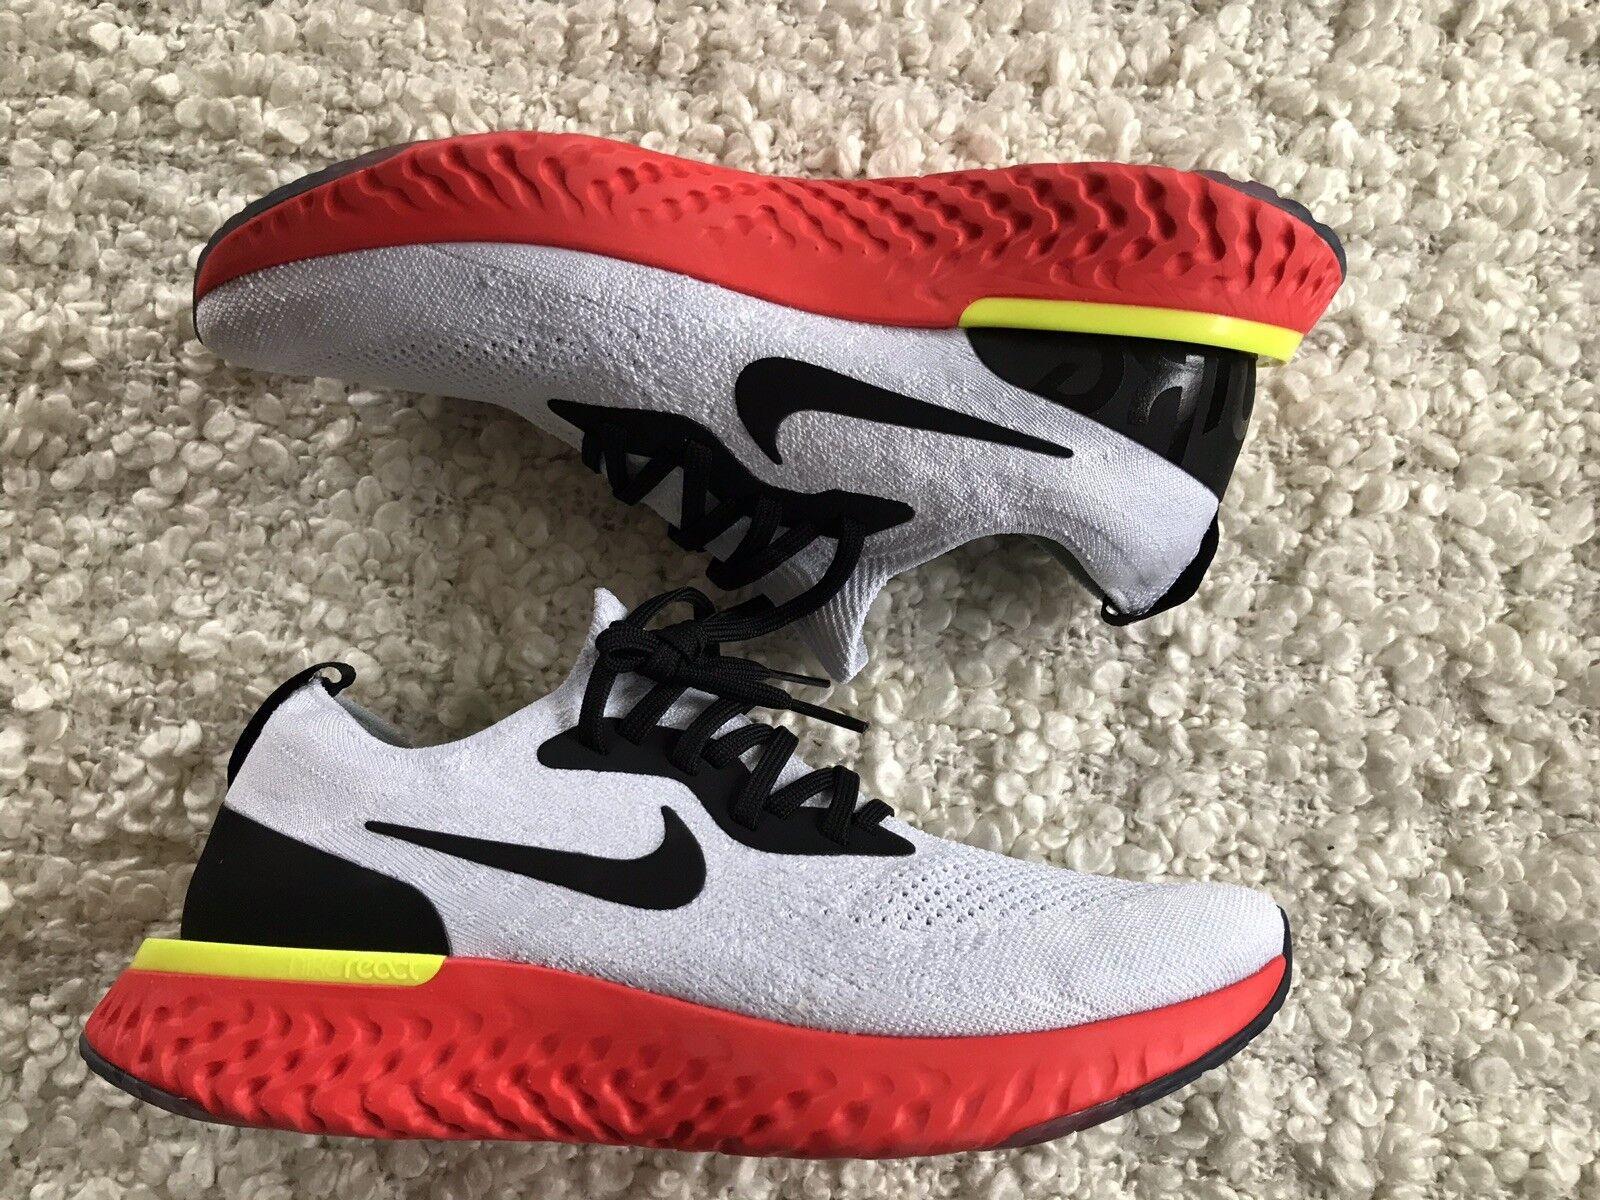 Nike Epic React Flyknit (Men's) - White Black orange - US 9,